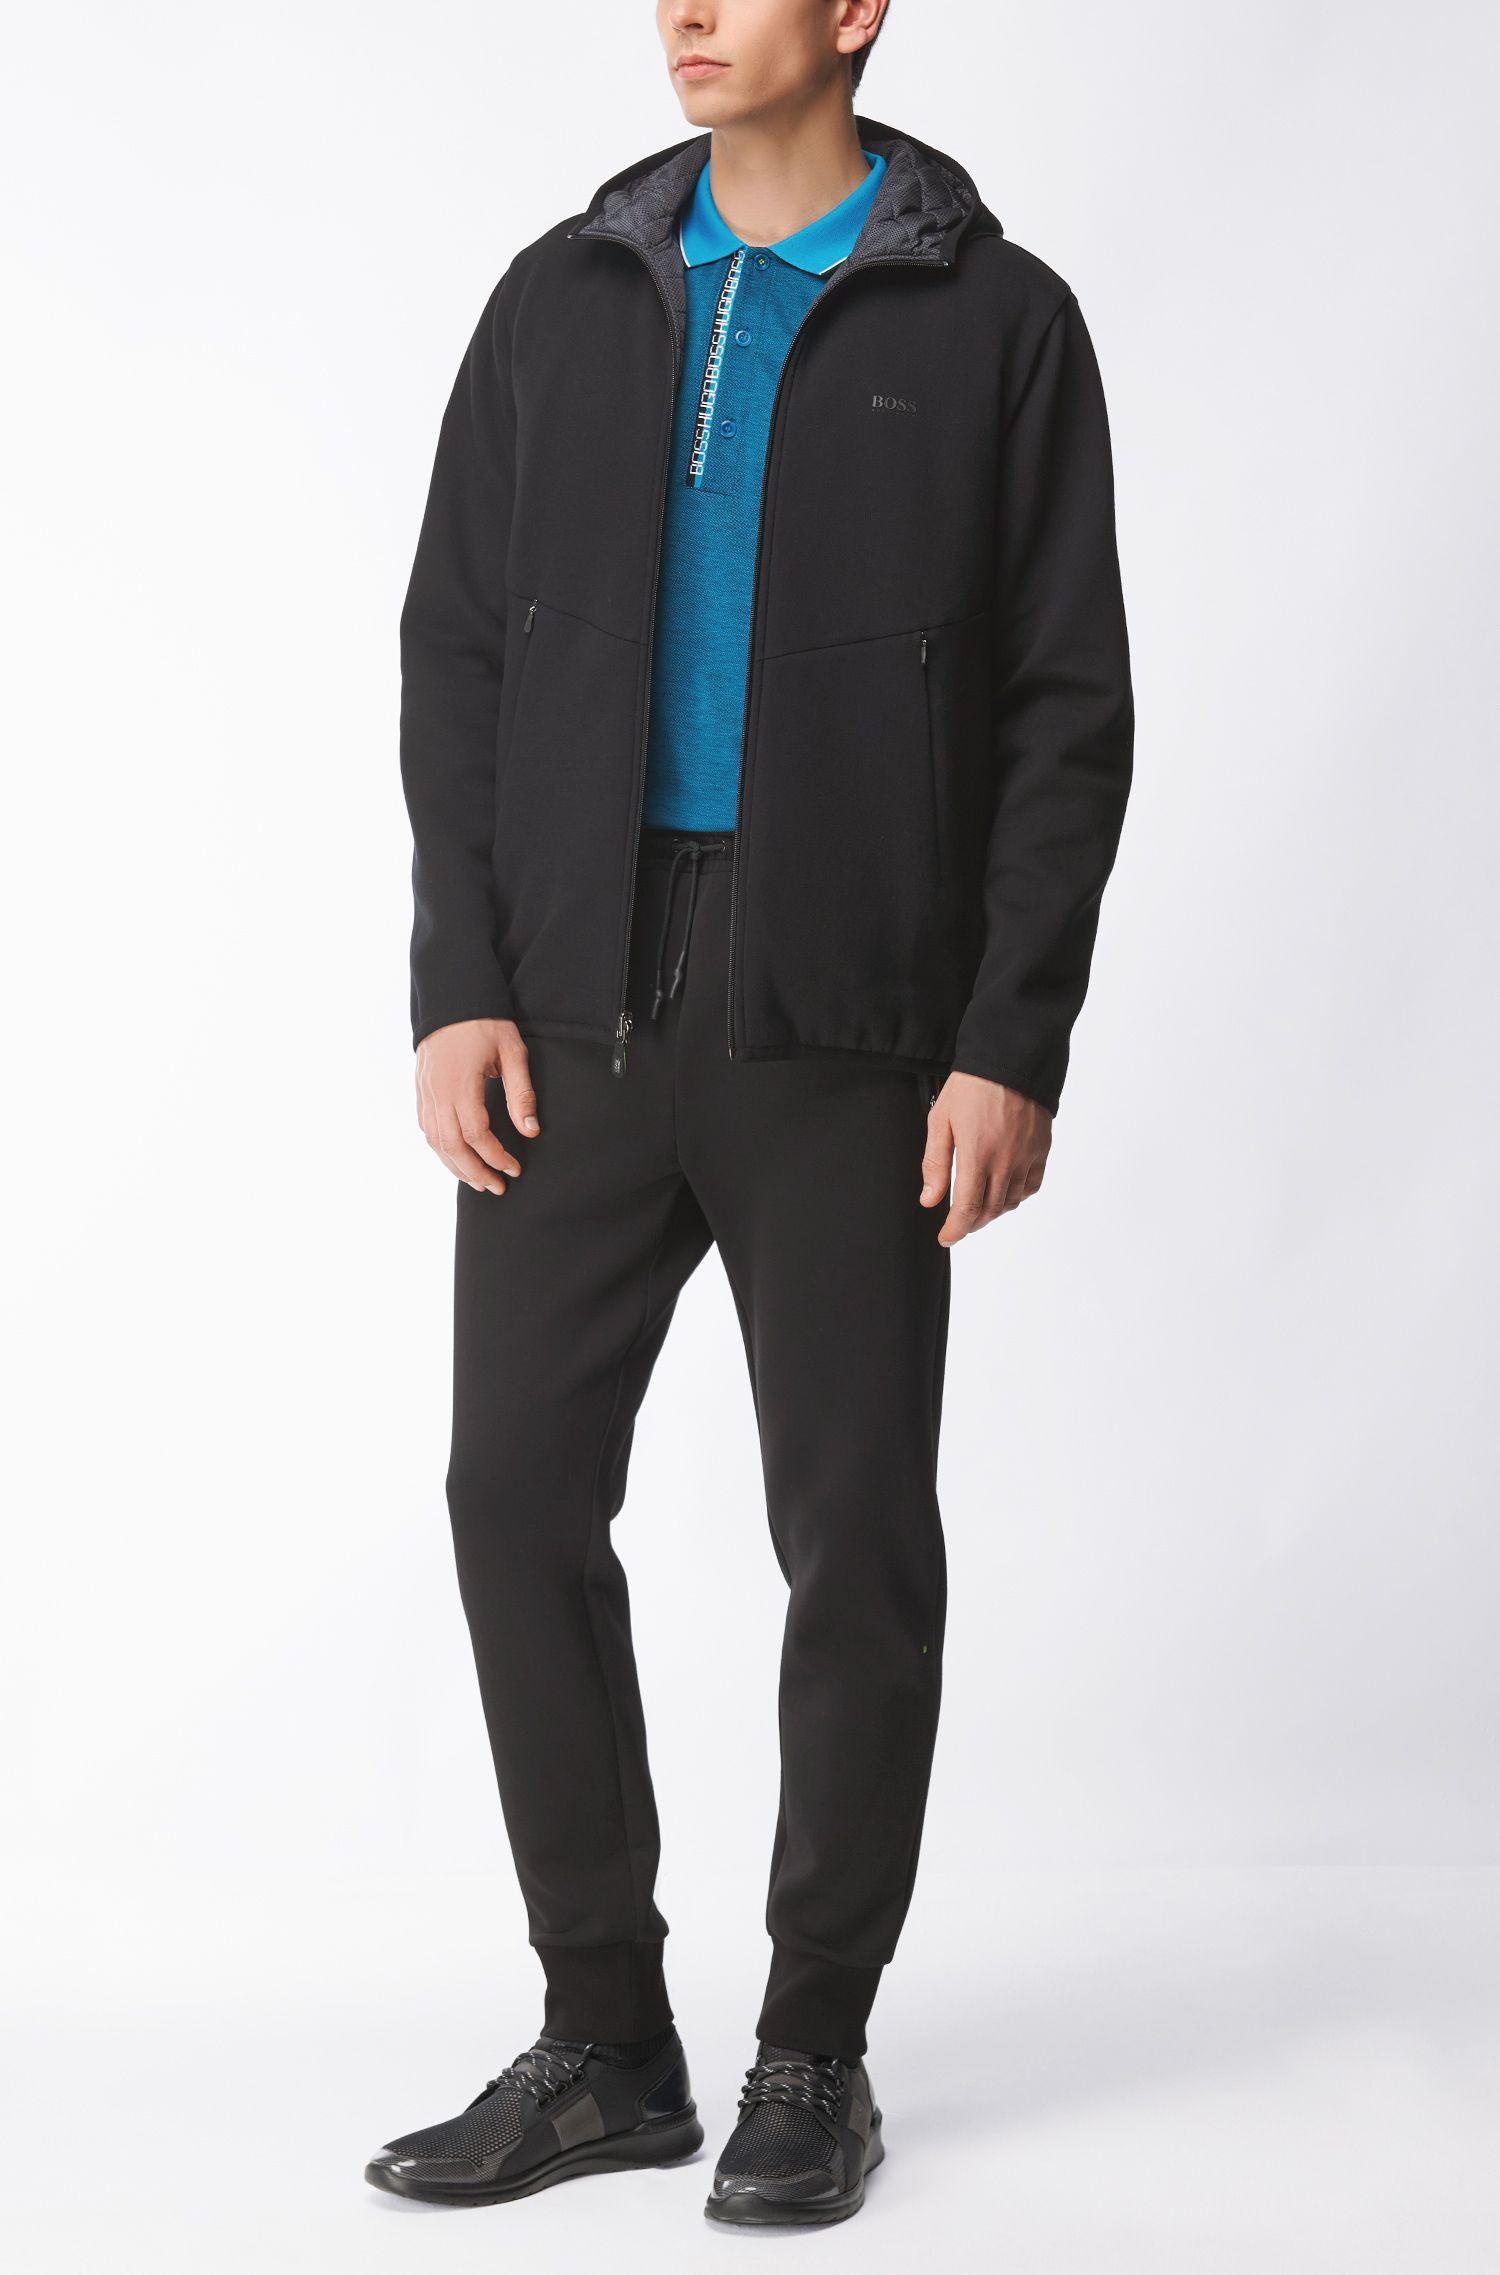 Contrast Cotton Polo Shirt, Slim Fit | Pleesy